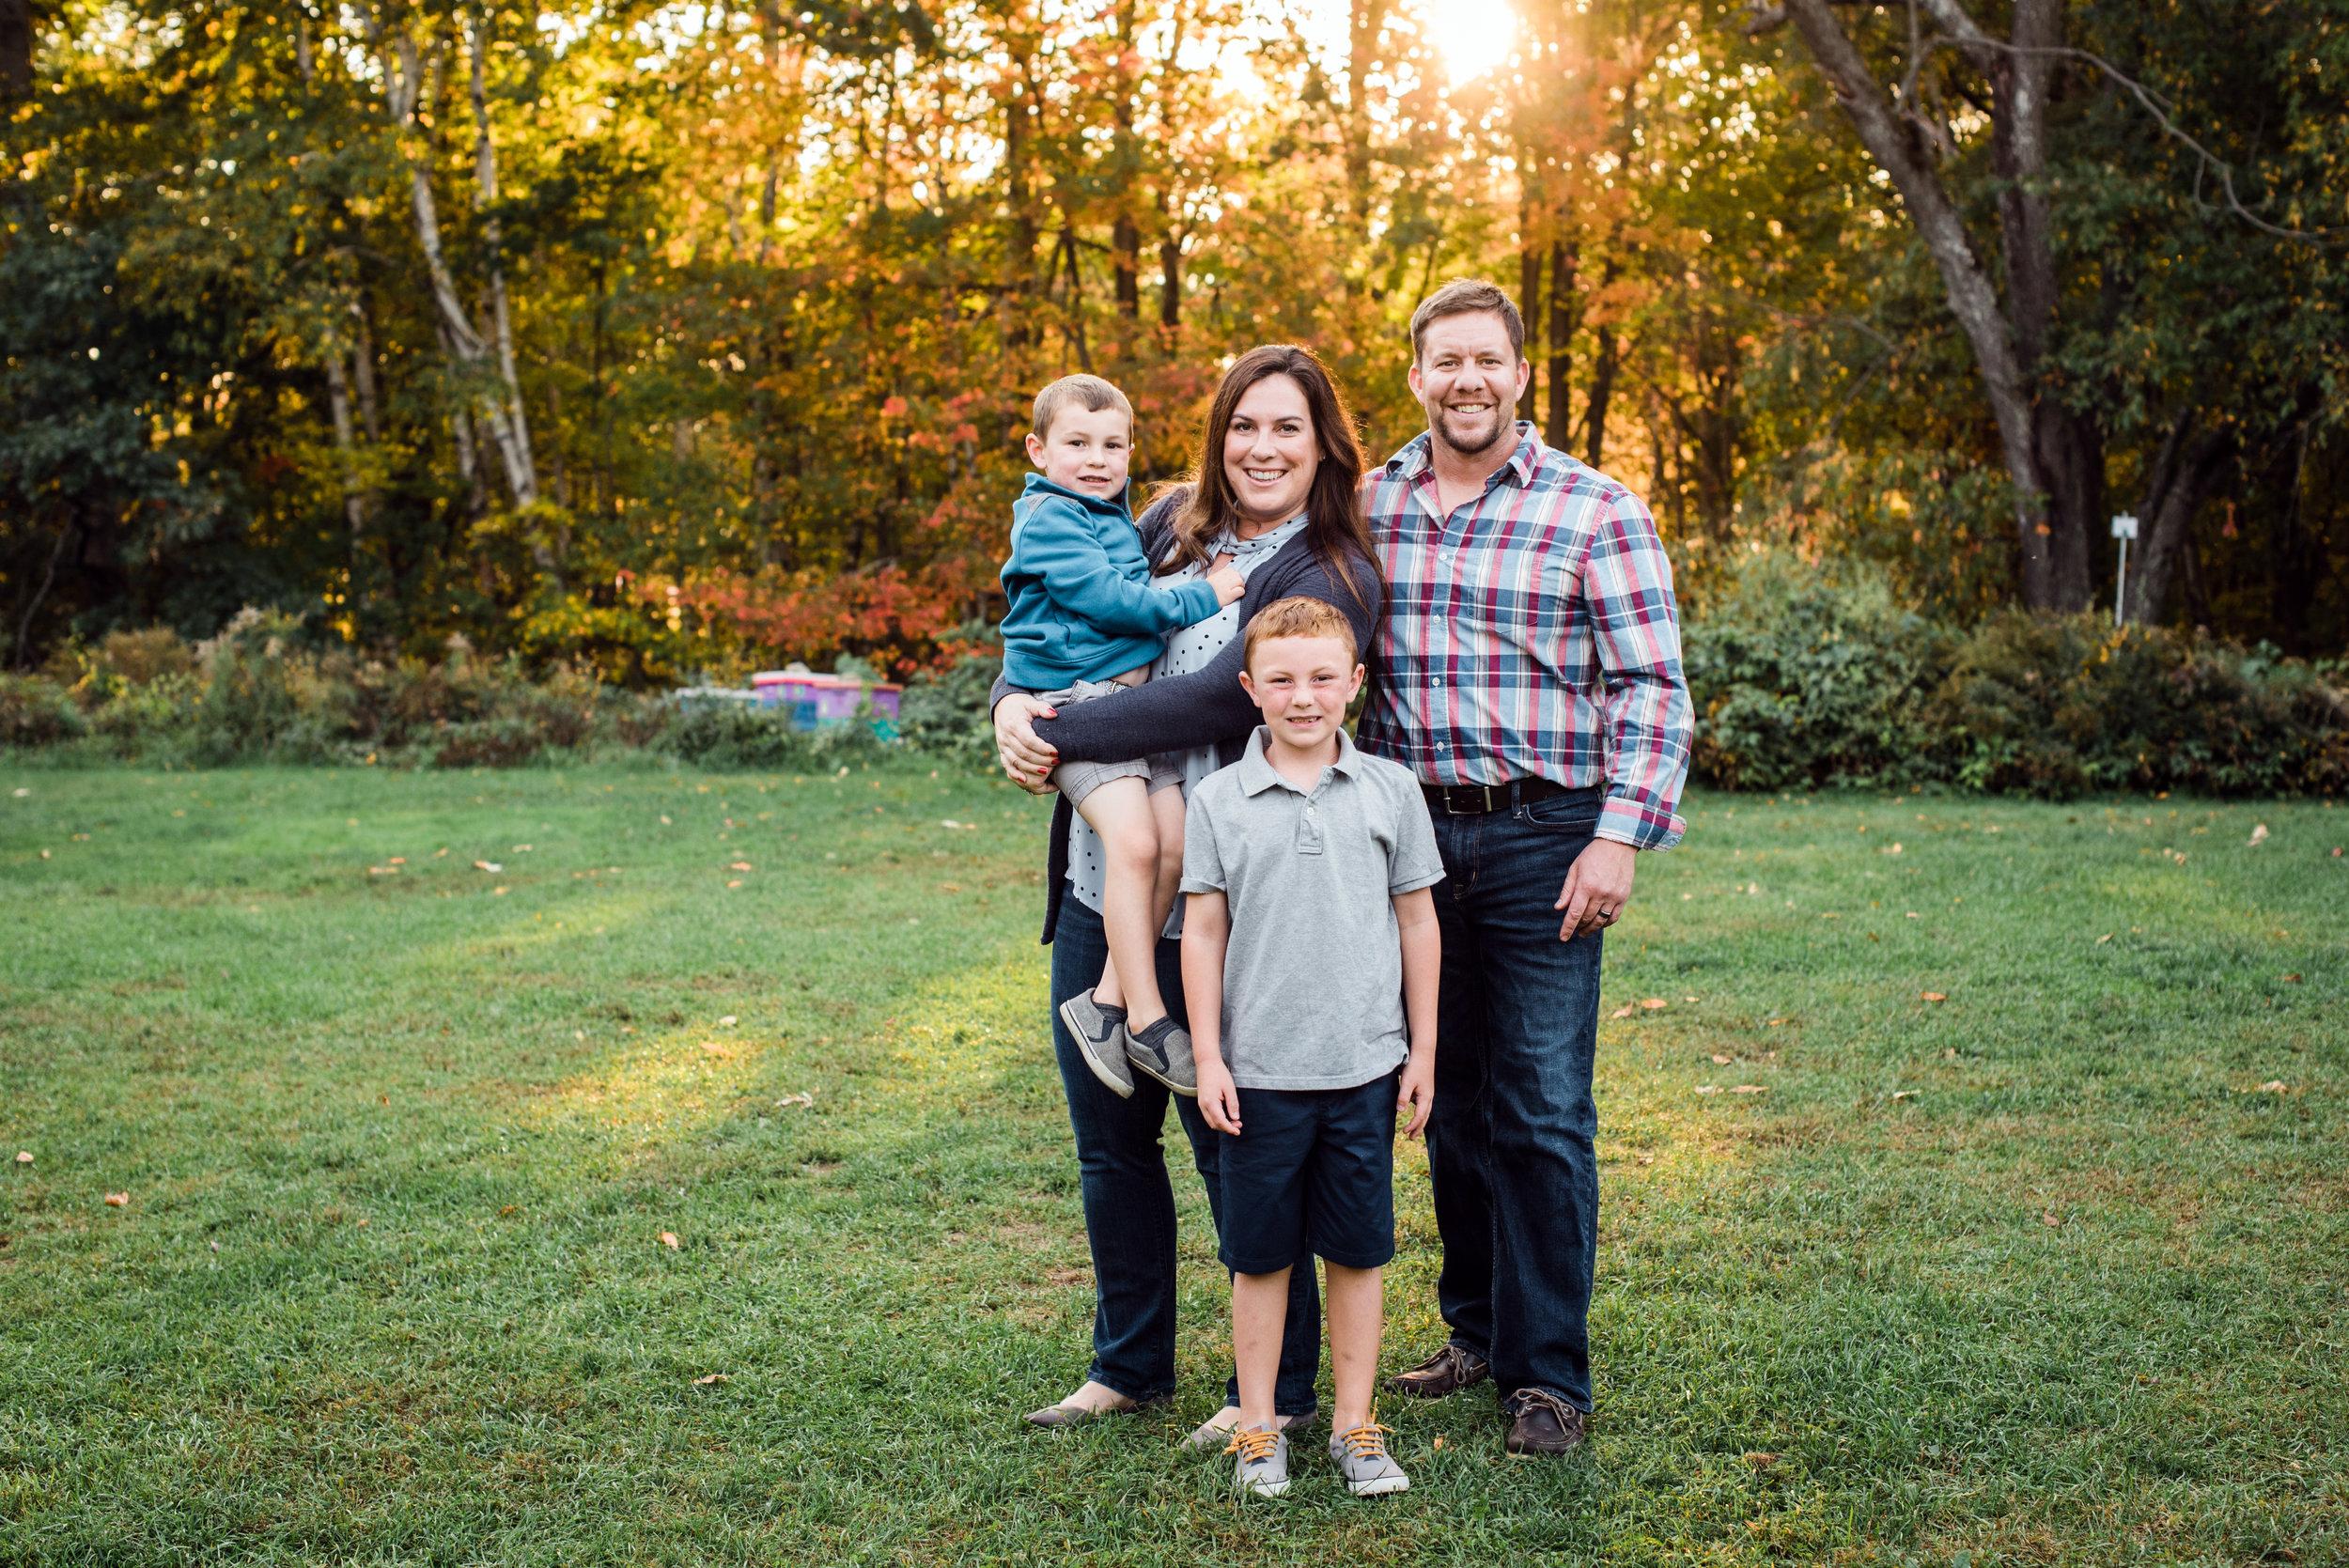 turnbullfamily-3.jpg